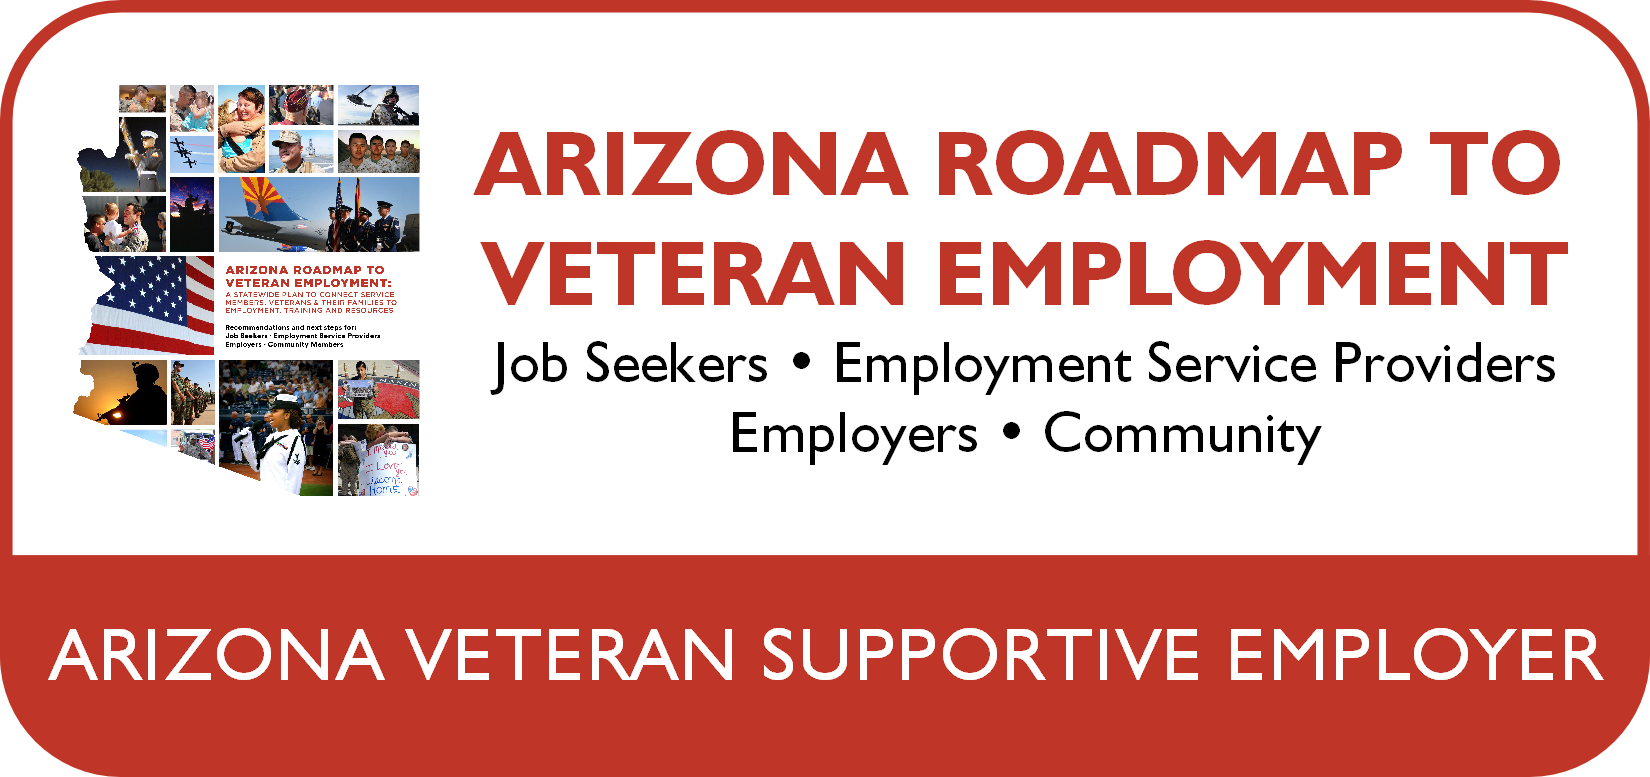 Arizona Roadmap to Veteran Employment